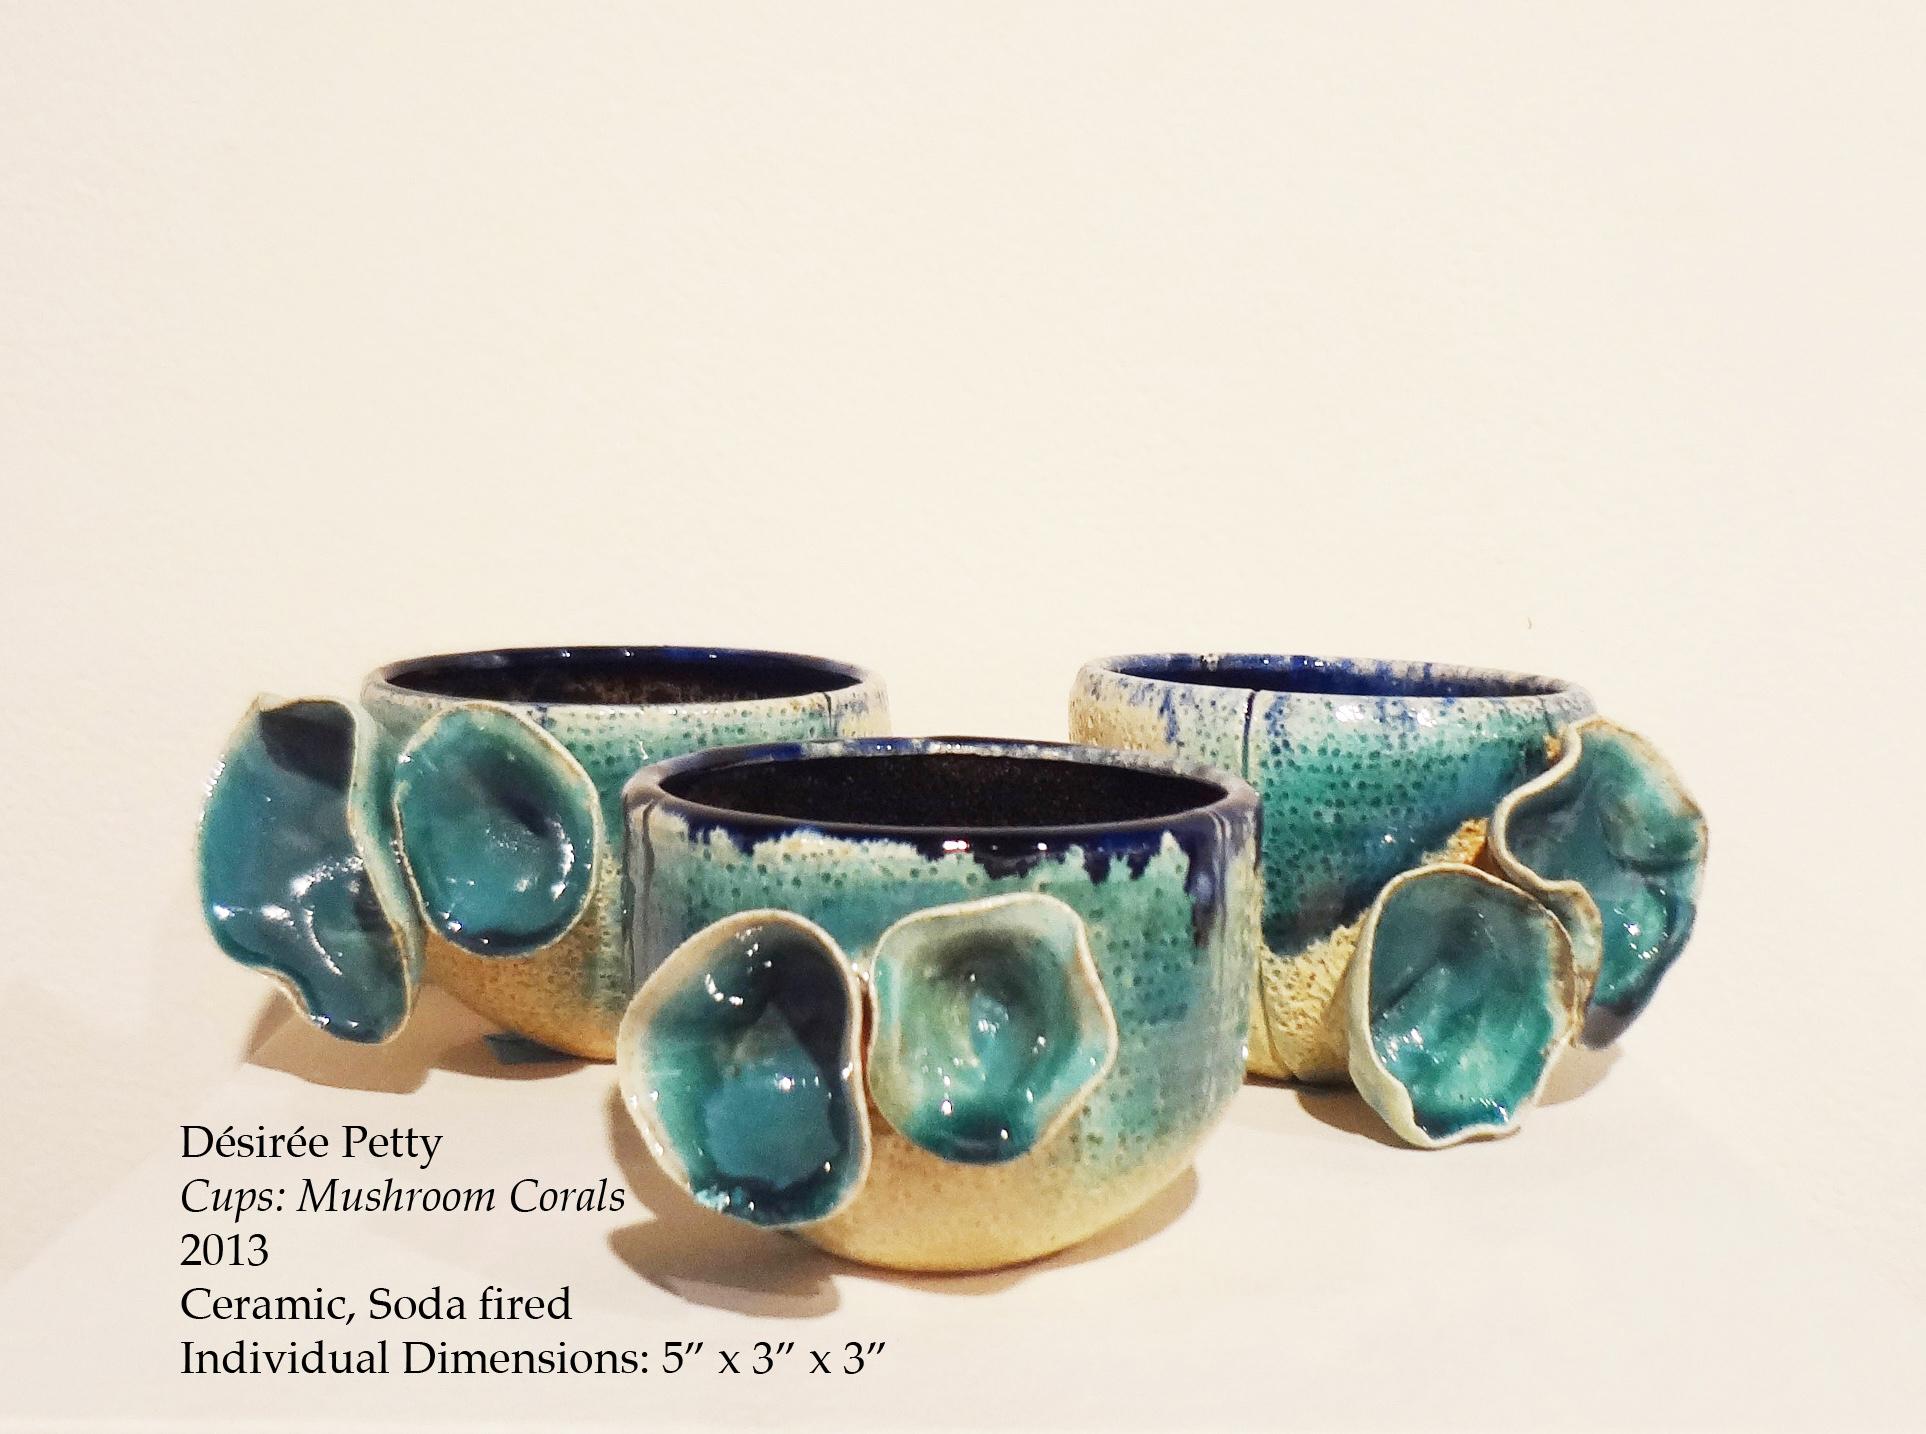 Drinking Vessels | Desiree Petty